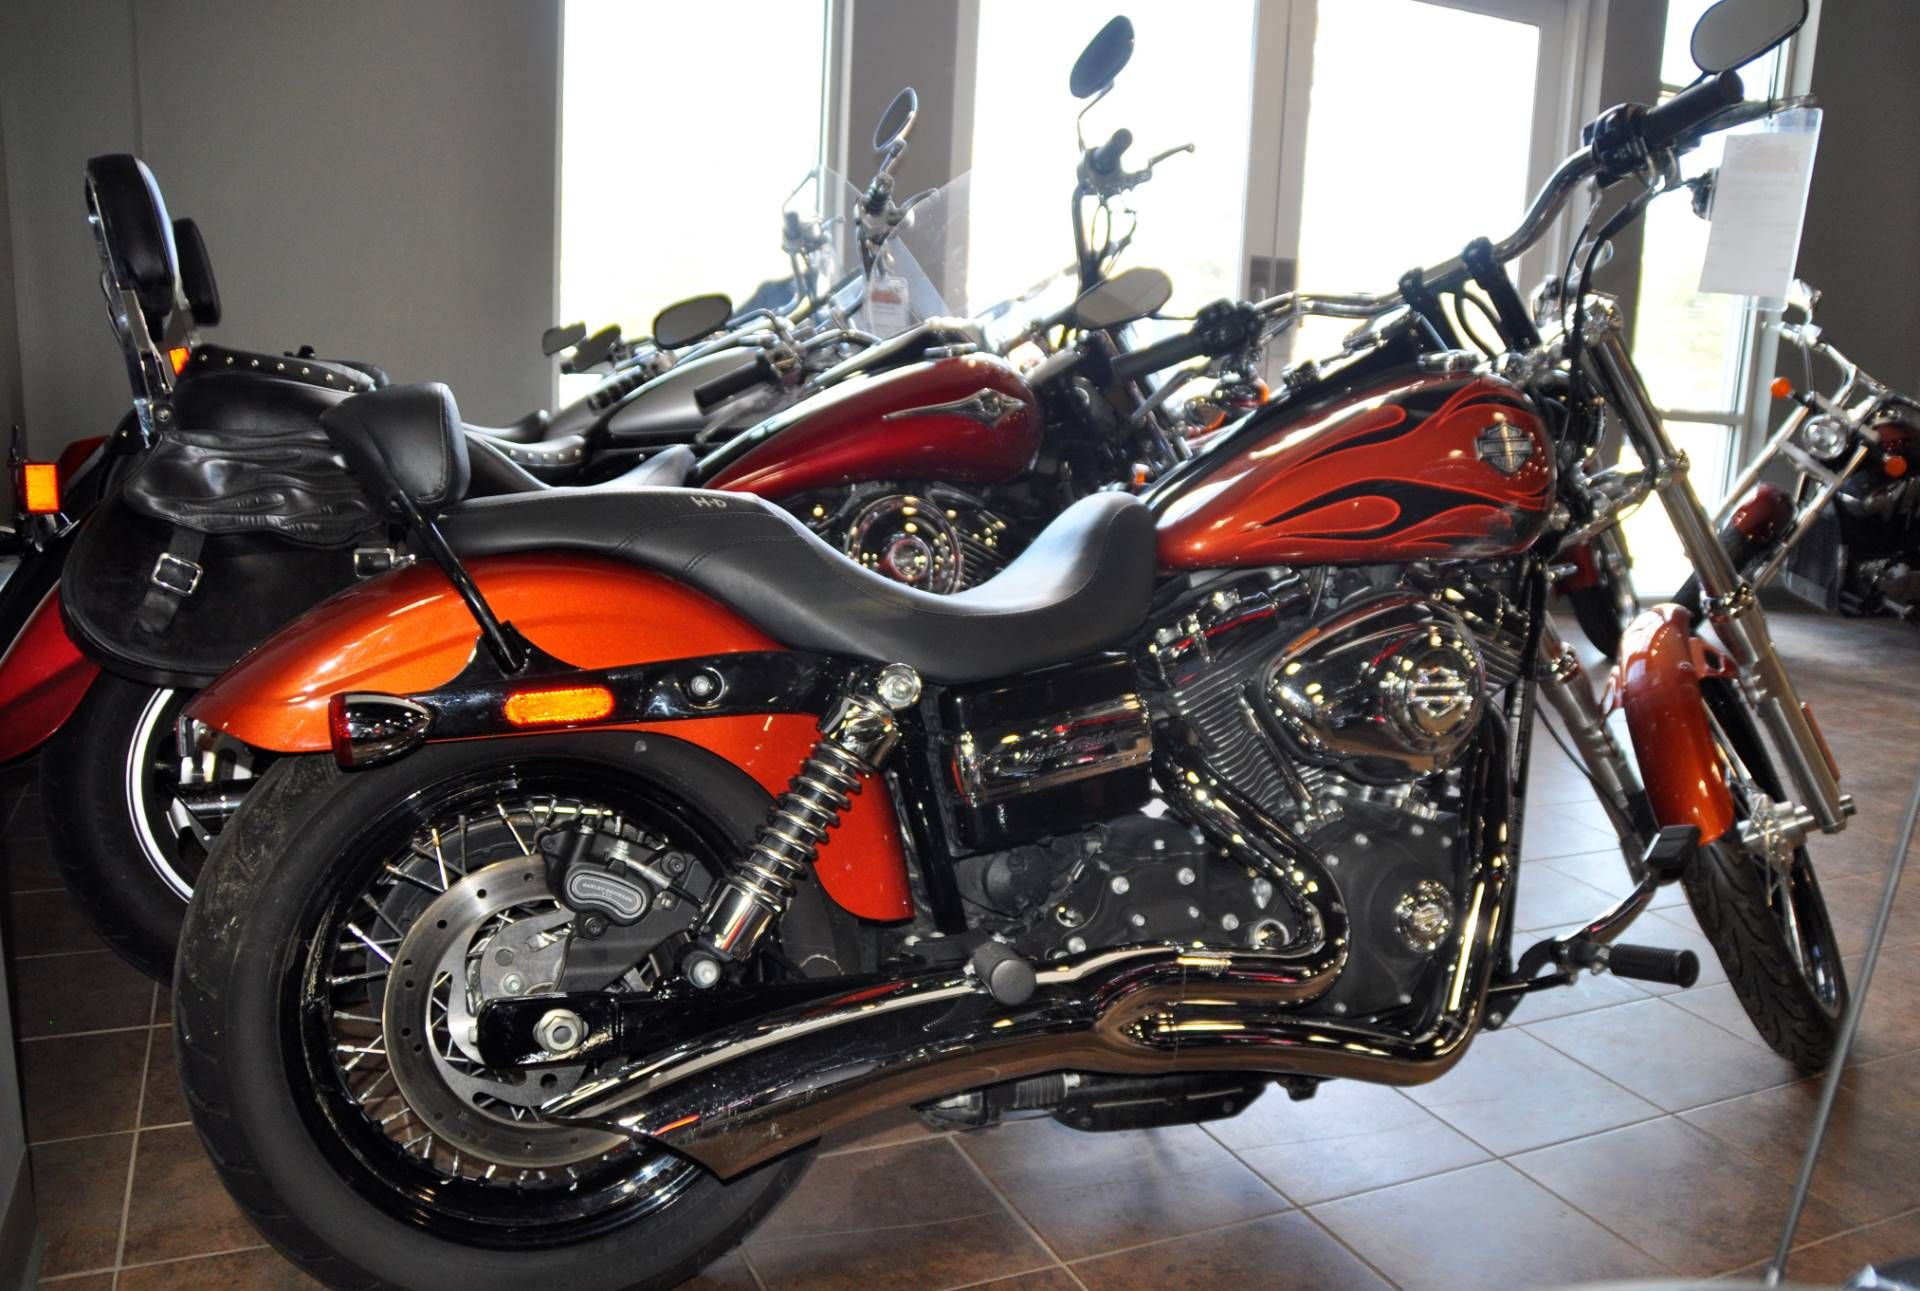 2011 Harley-Davidson Dyna Wide Glide 2